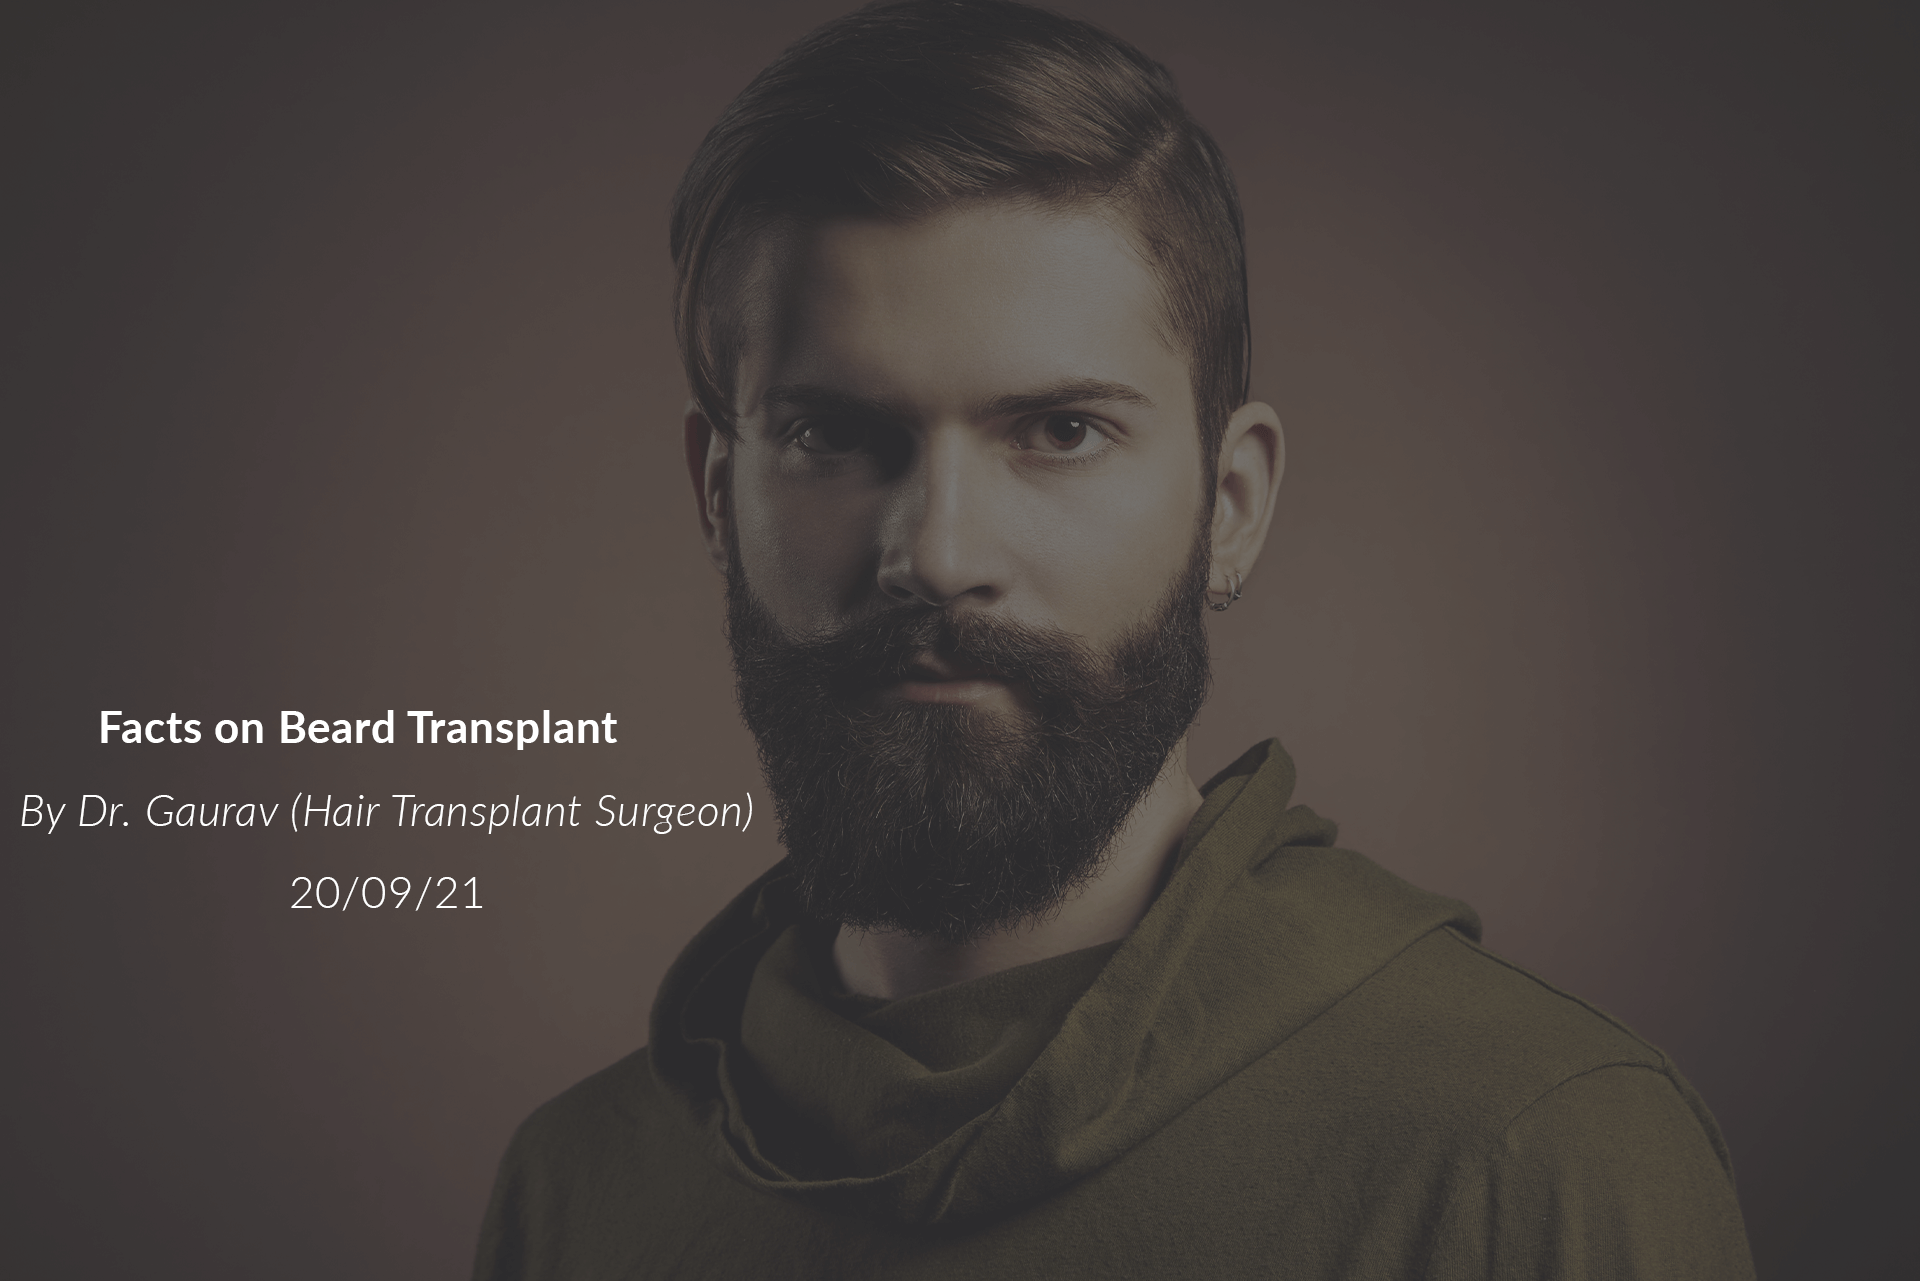 Facts on Beard Transplant